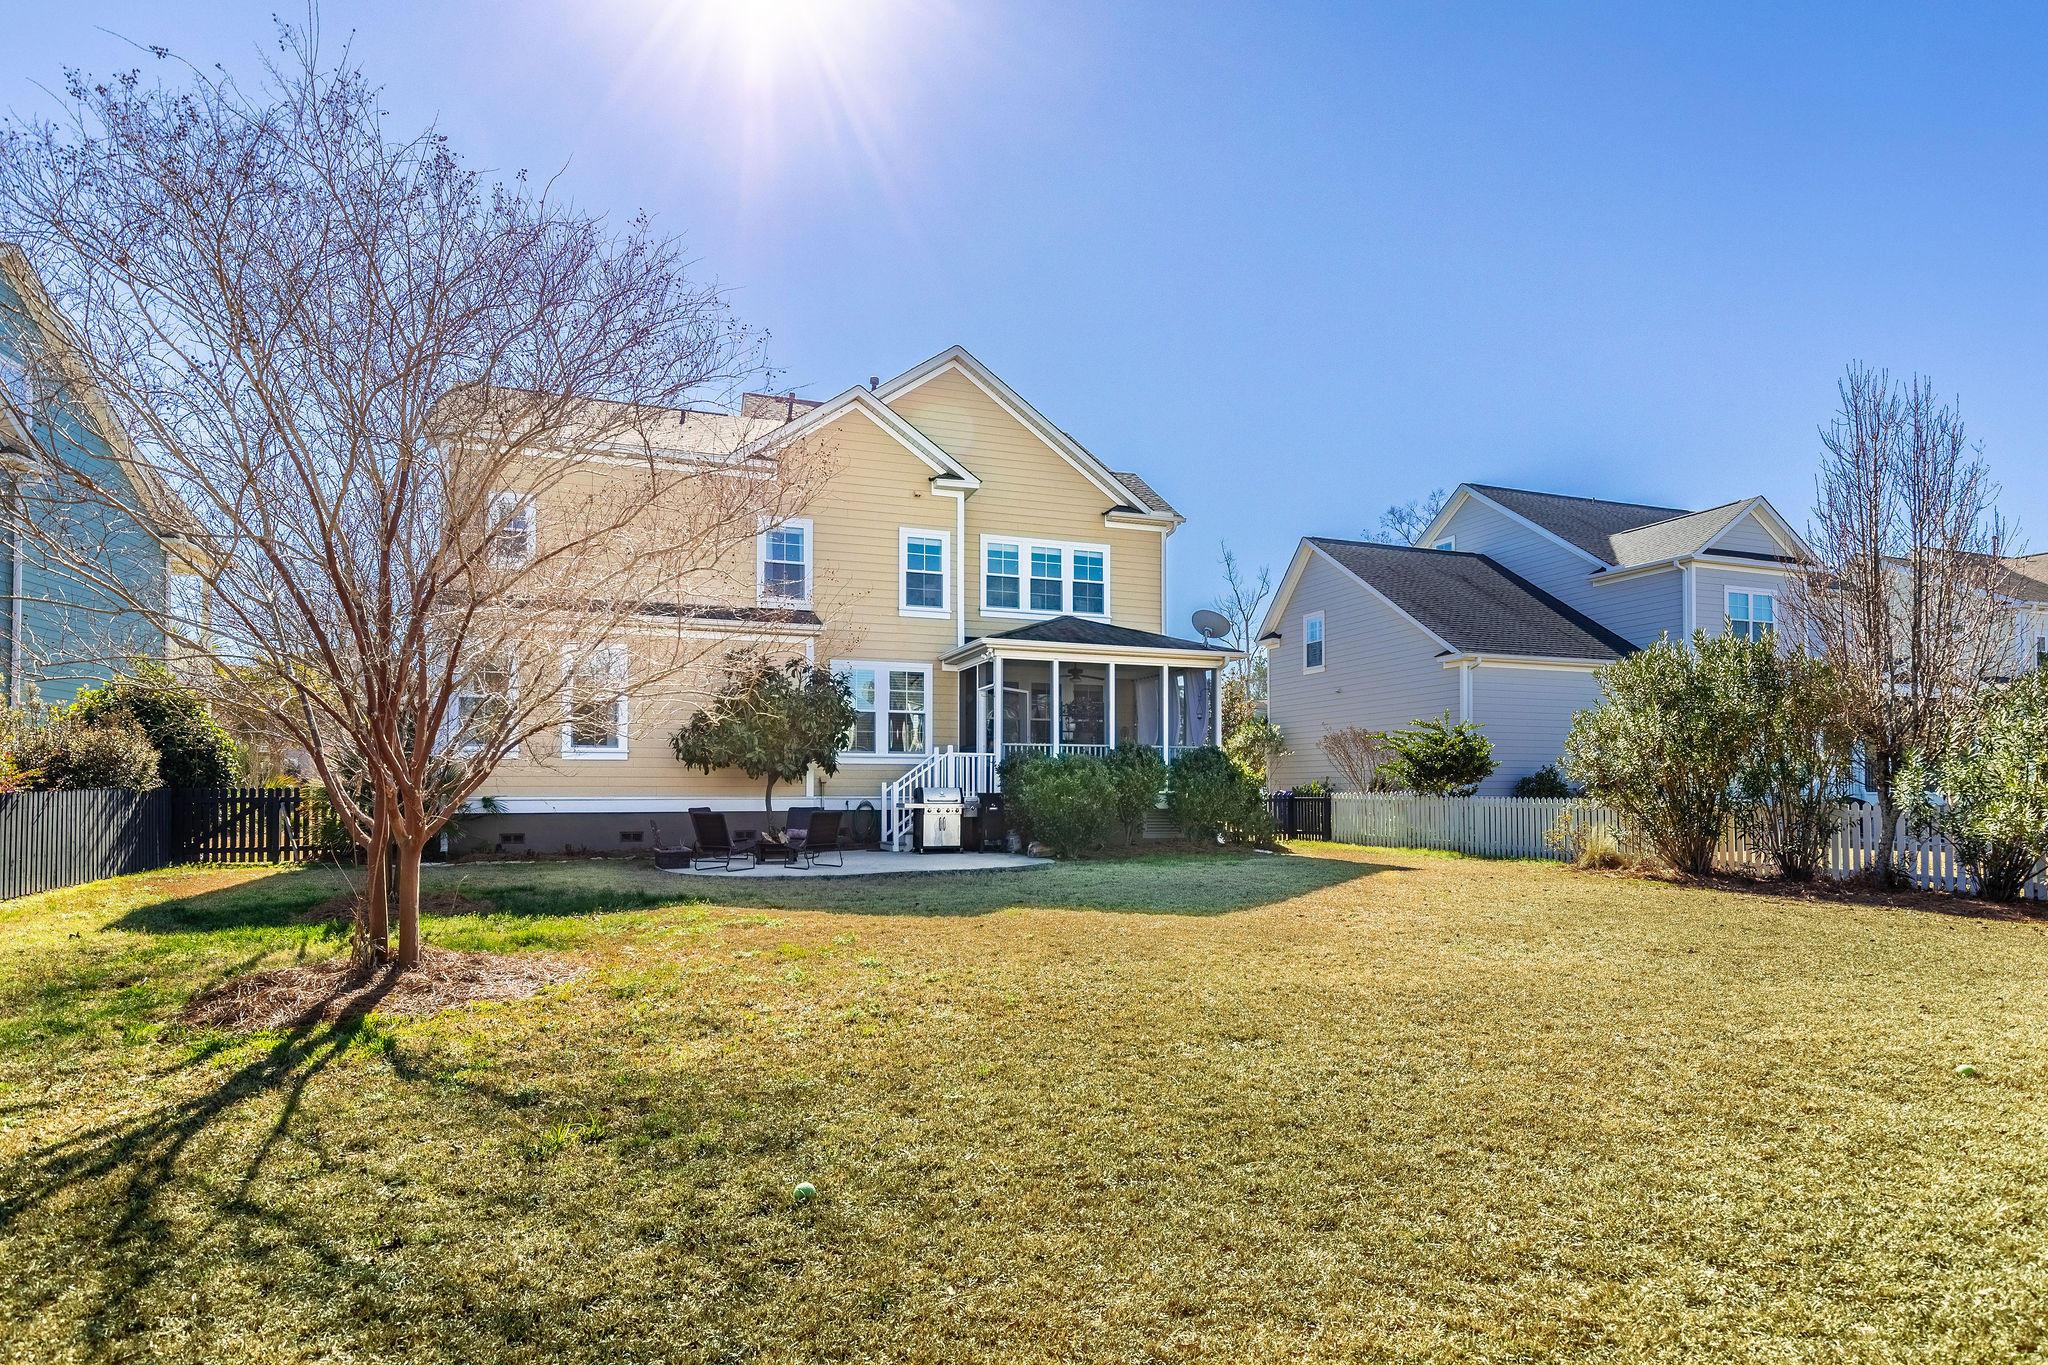 Dunes West Homes For Sale - 3212 Hatchway, Mount Pleasant, SC - 62